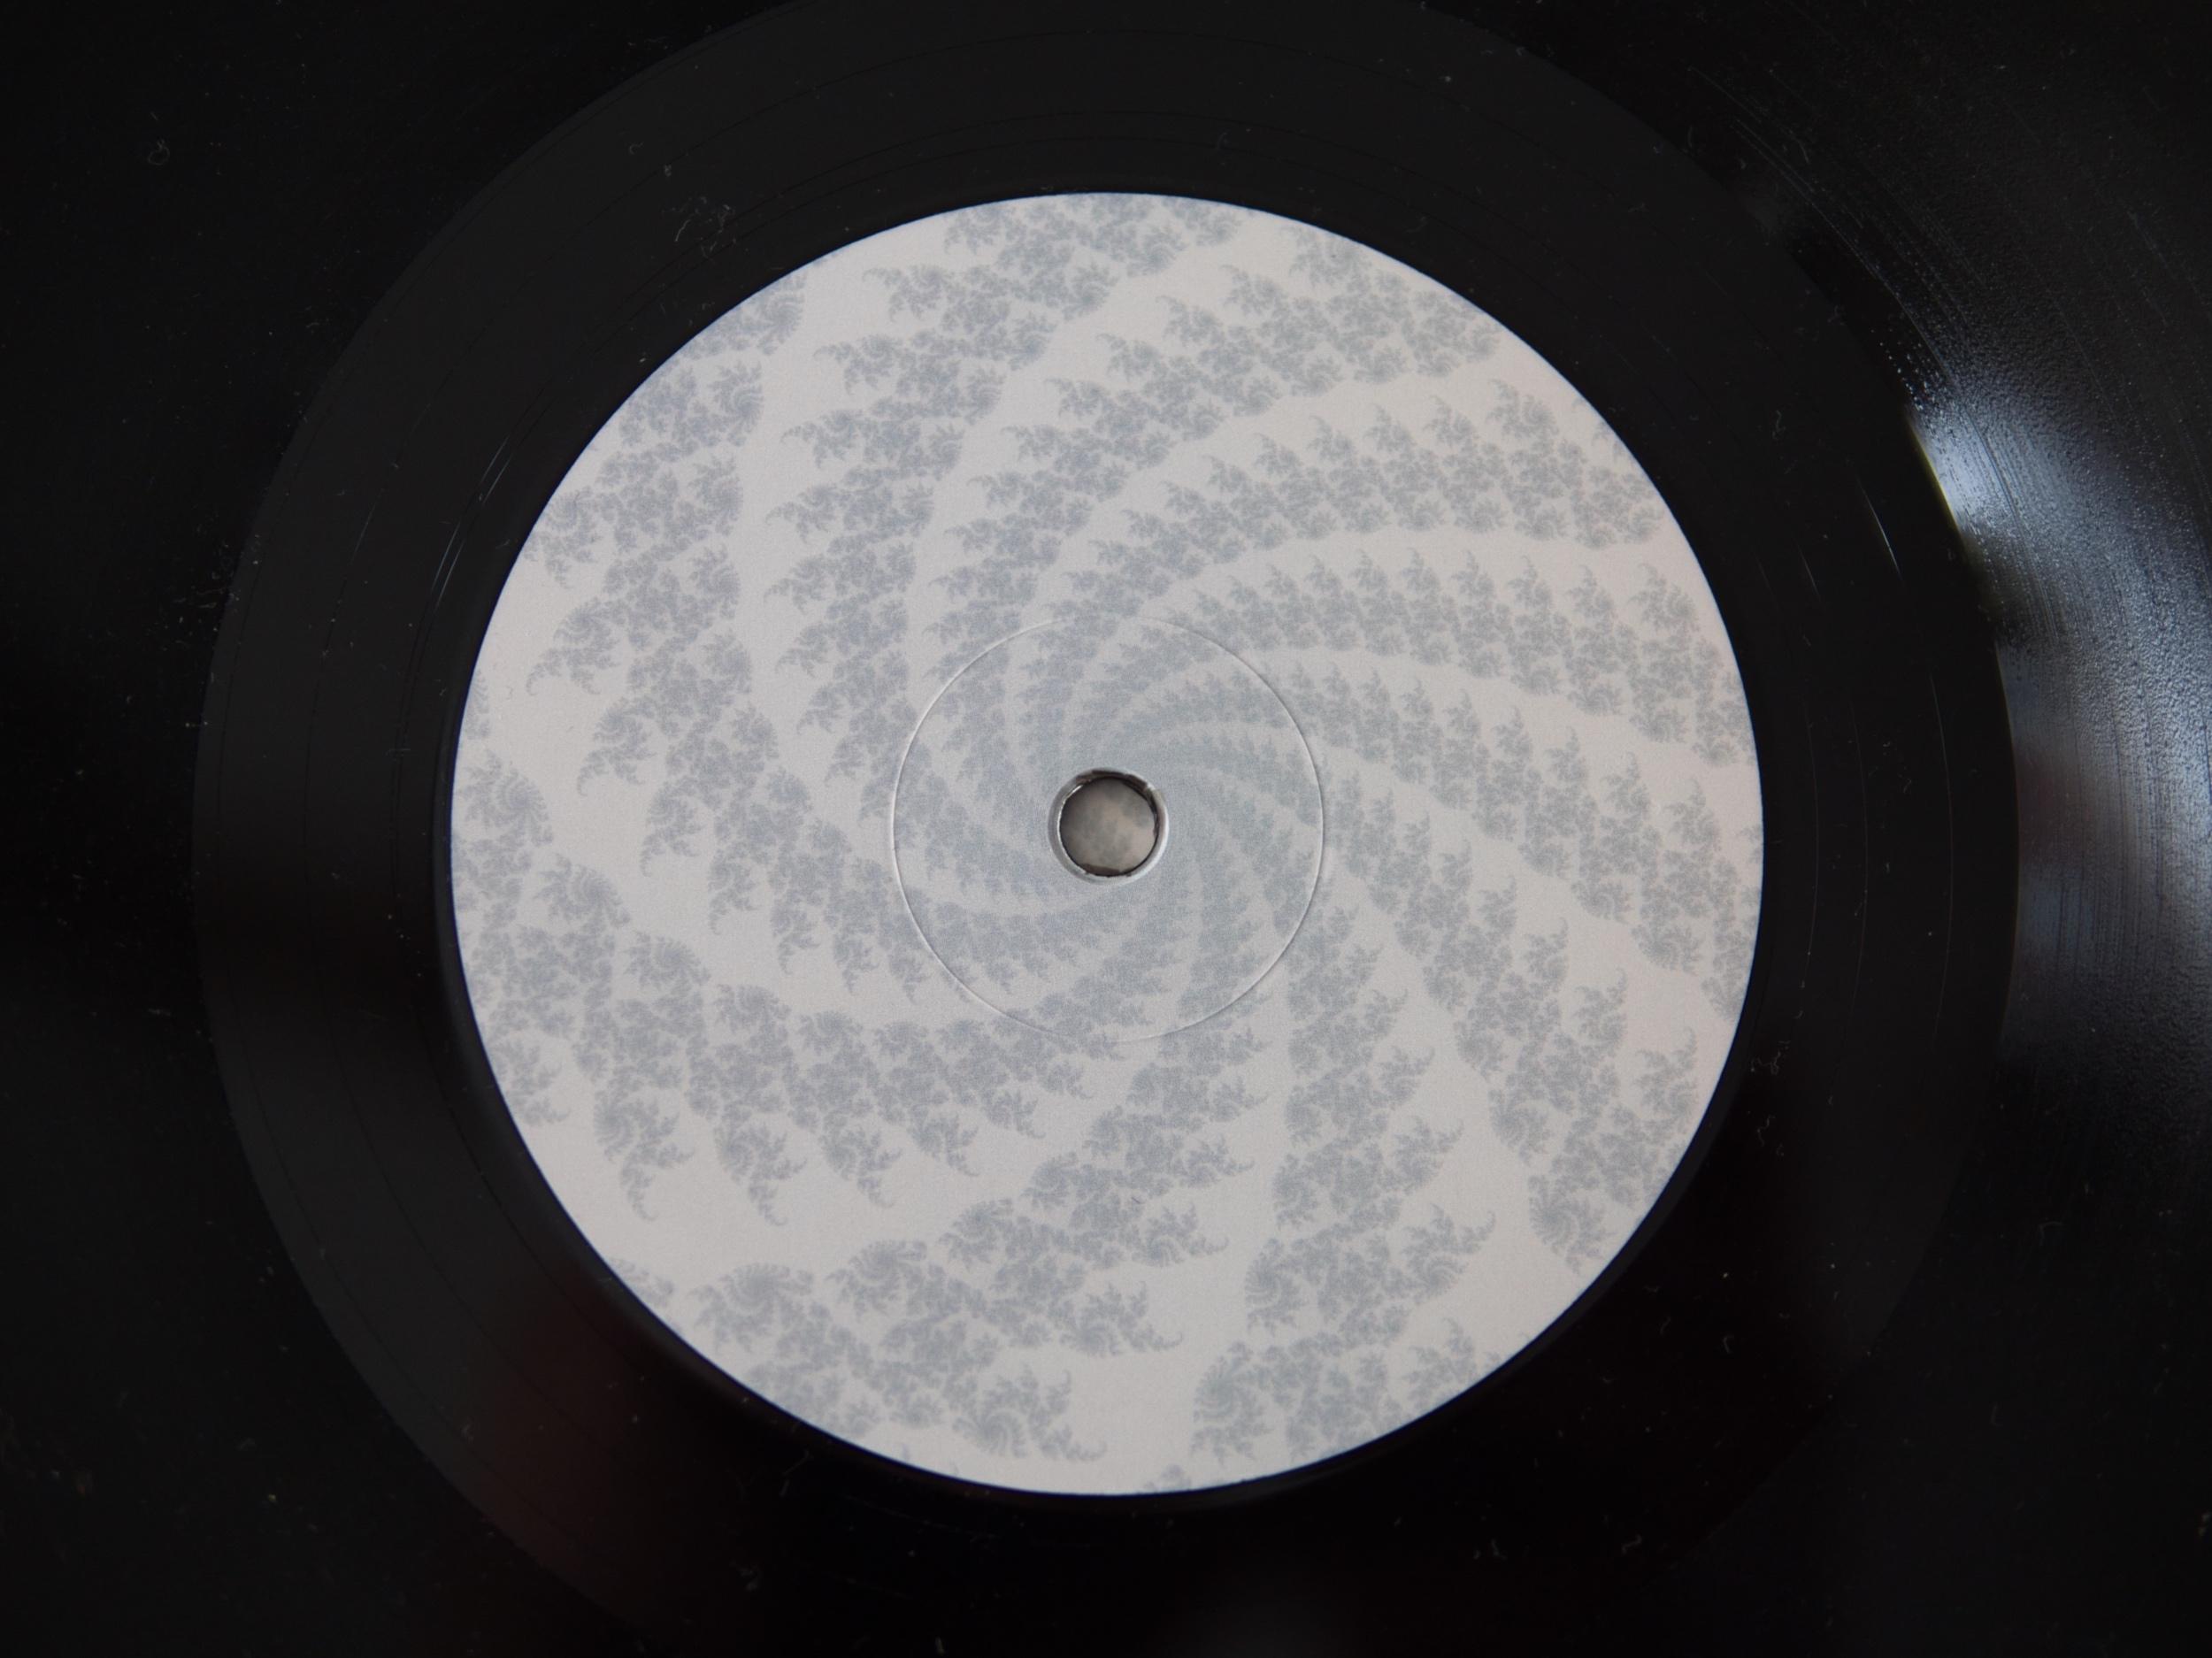 TD-02 Label A